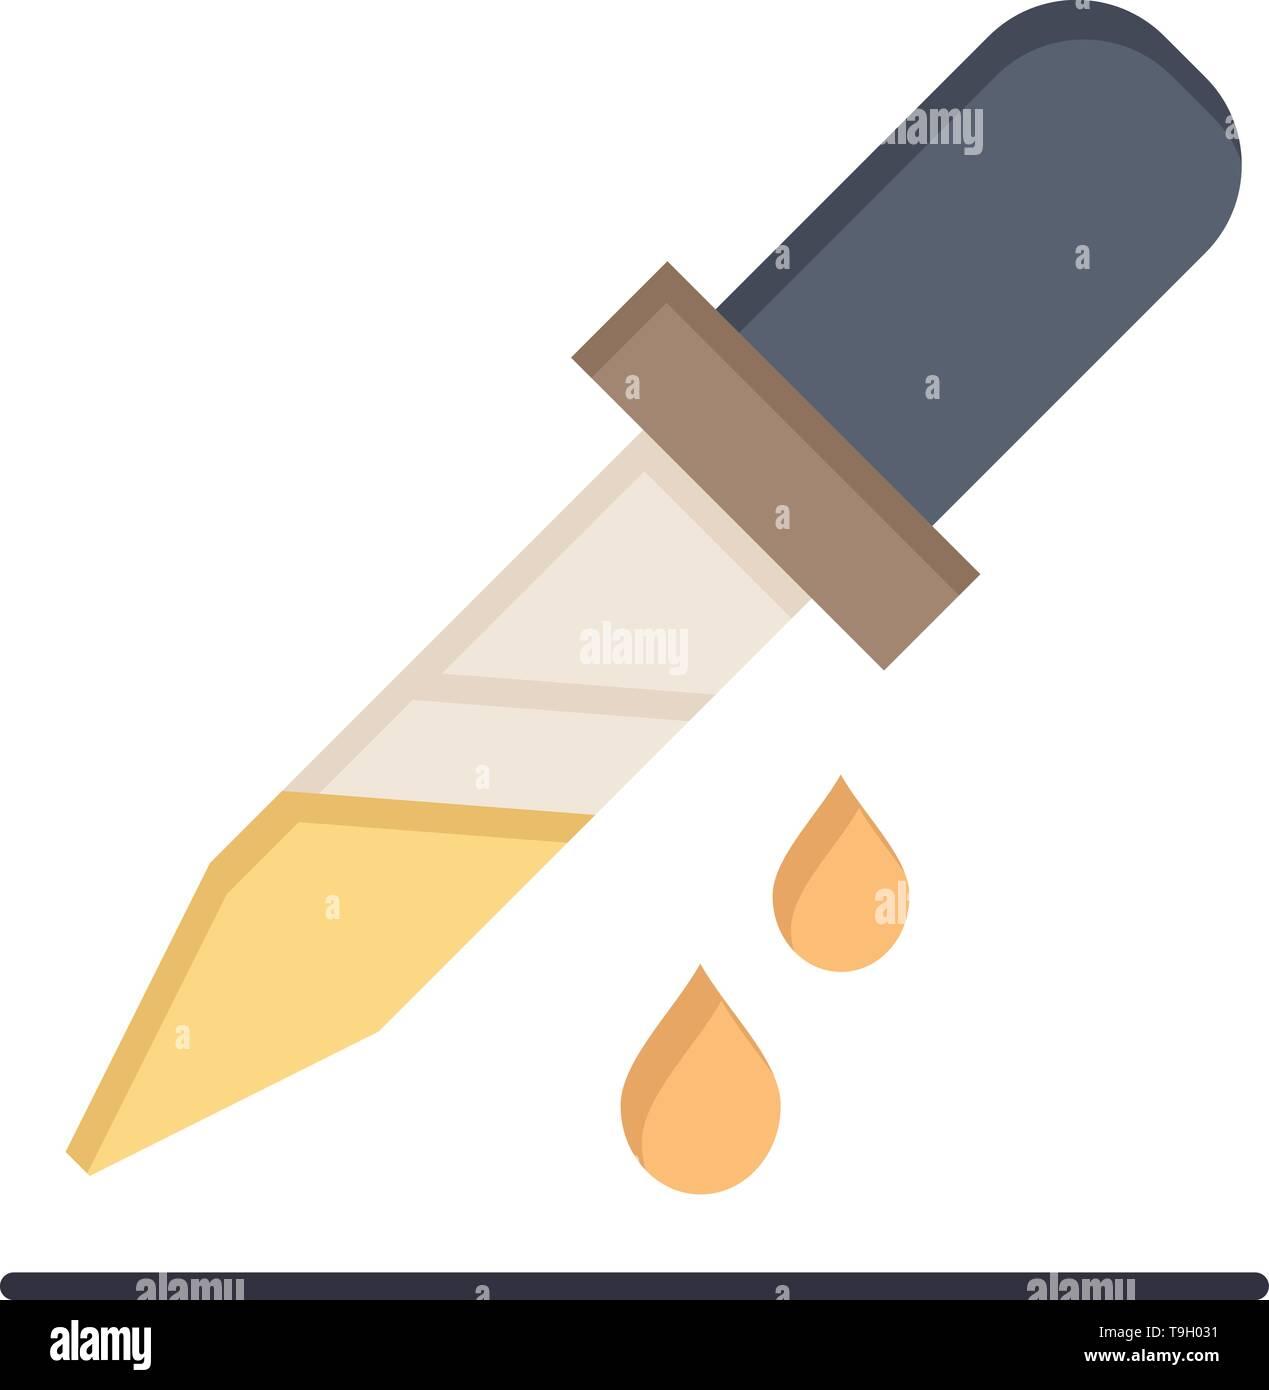 Drop, Dropper, Medical, Medicine  Flat Color Icon. Vector icon banner Template - Stock Image